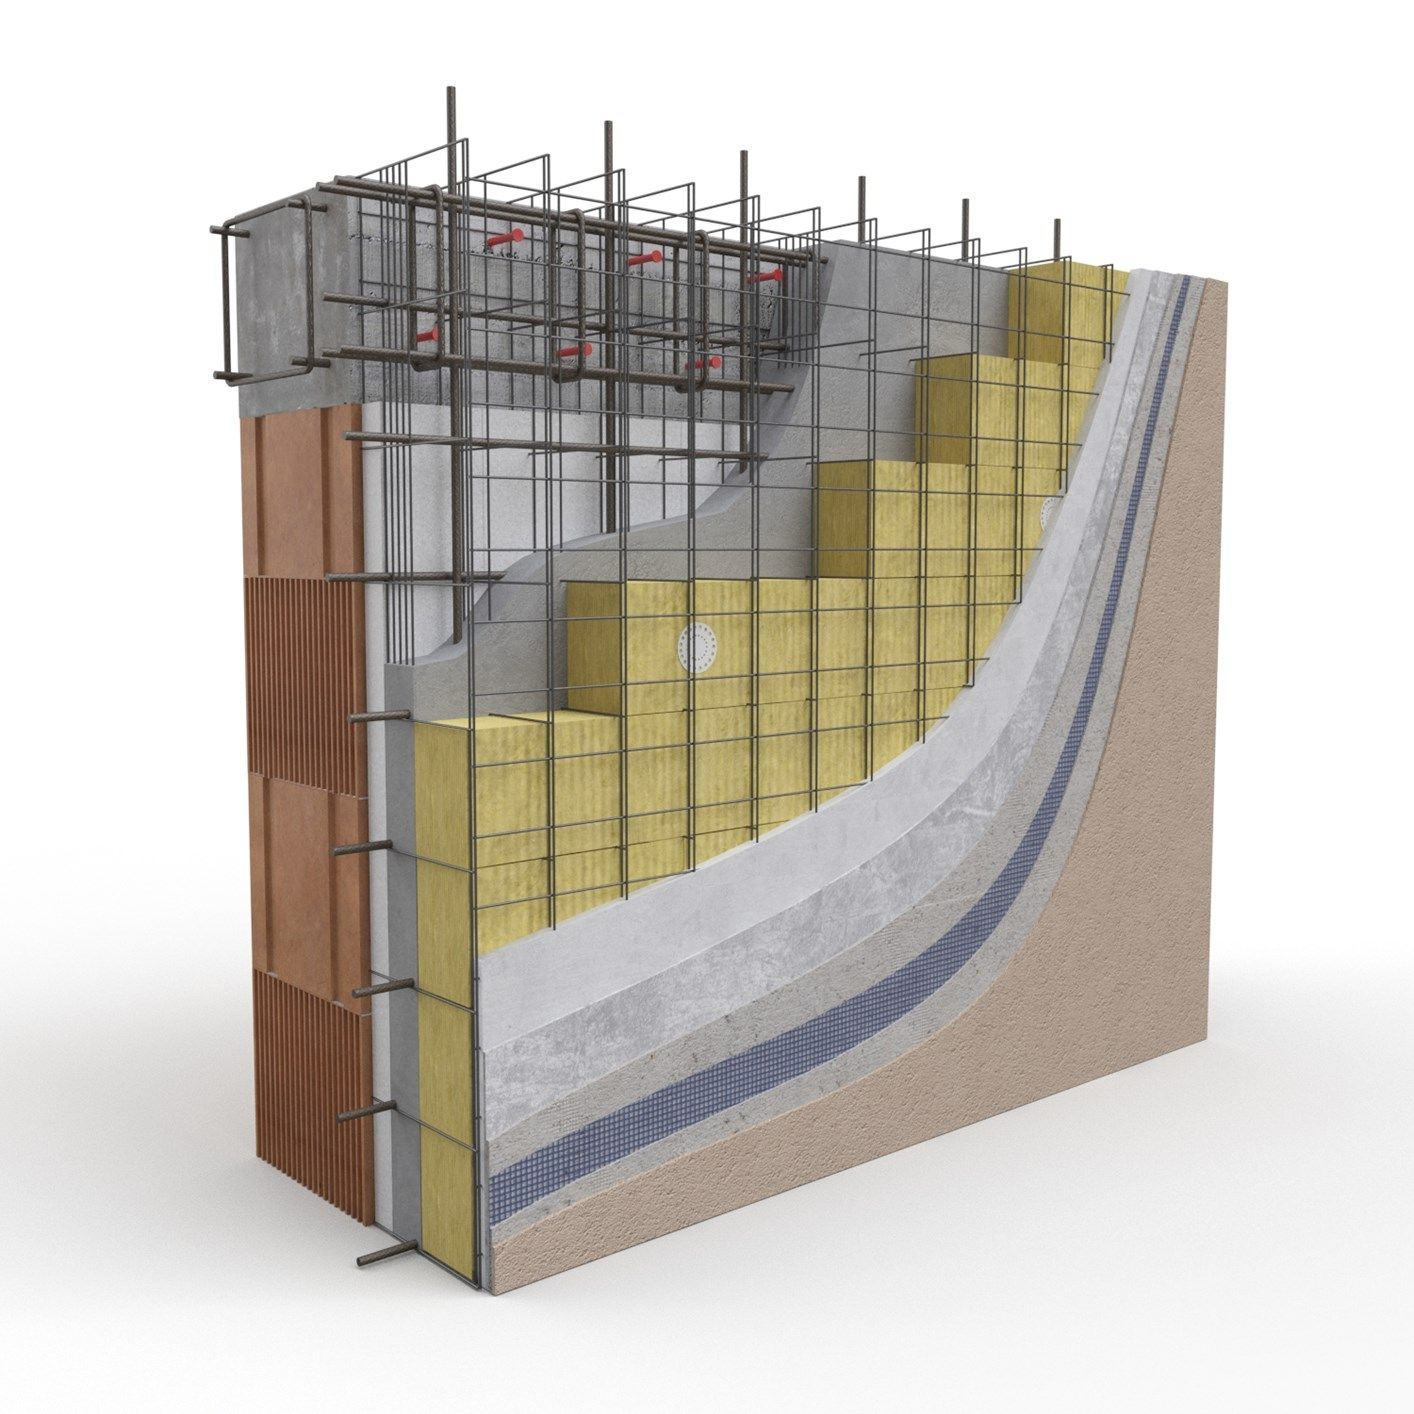 Ecosism a Klimahouse 2020 con Geniale Cappotto Sismico®